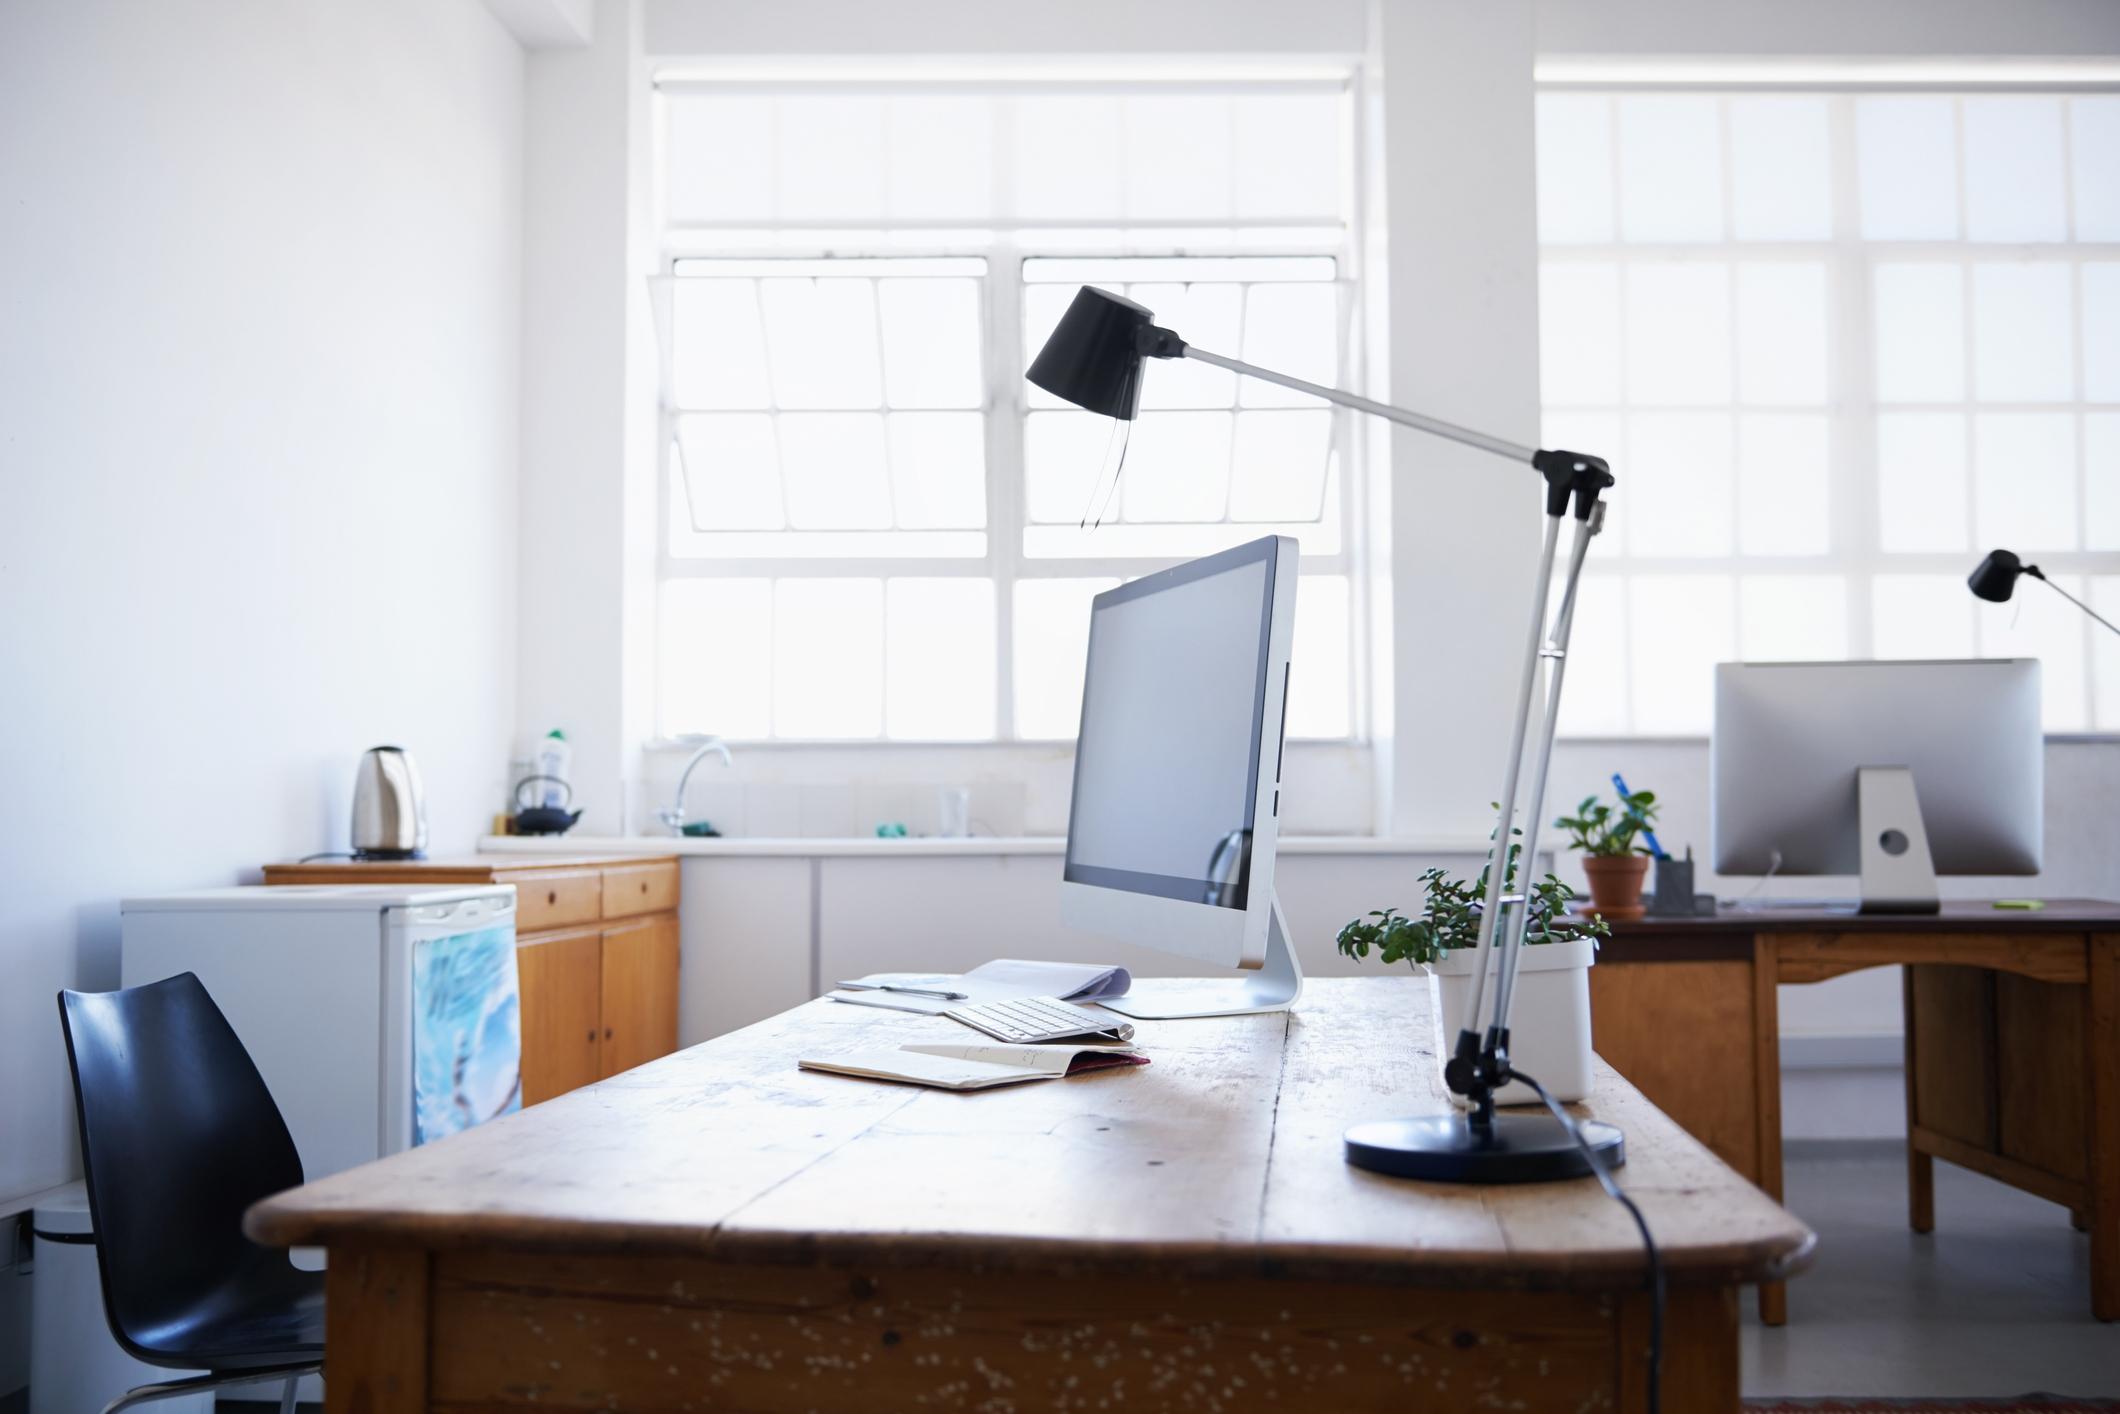 A home office desk